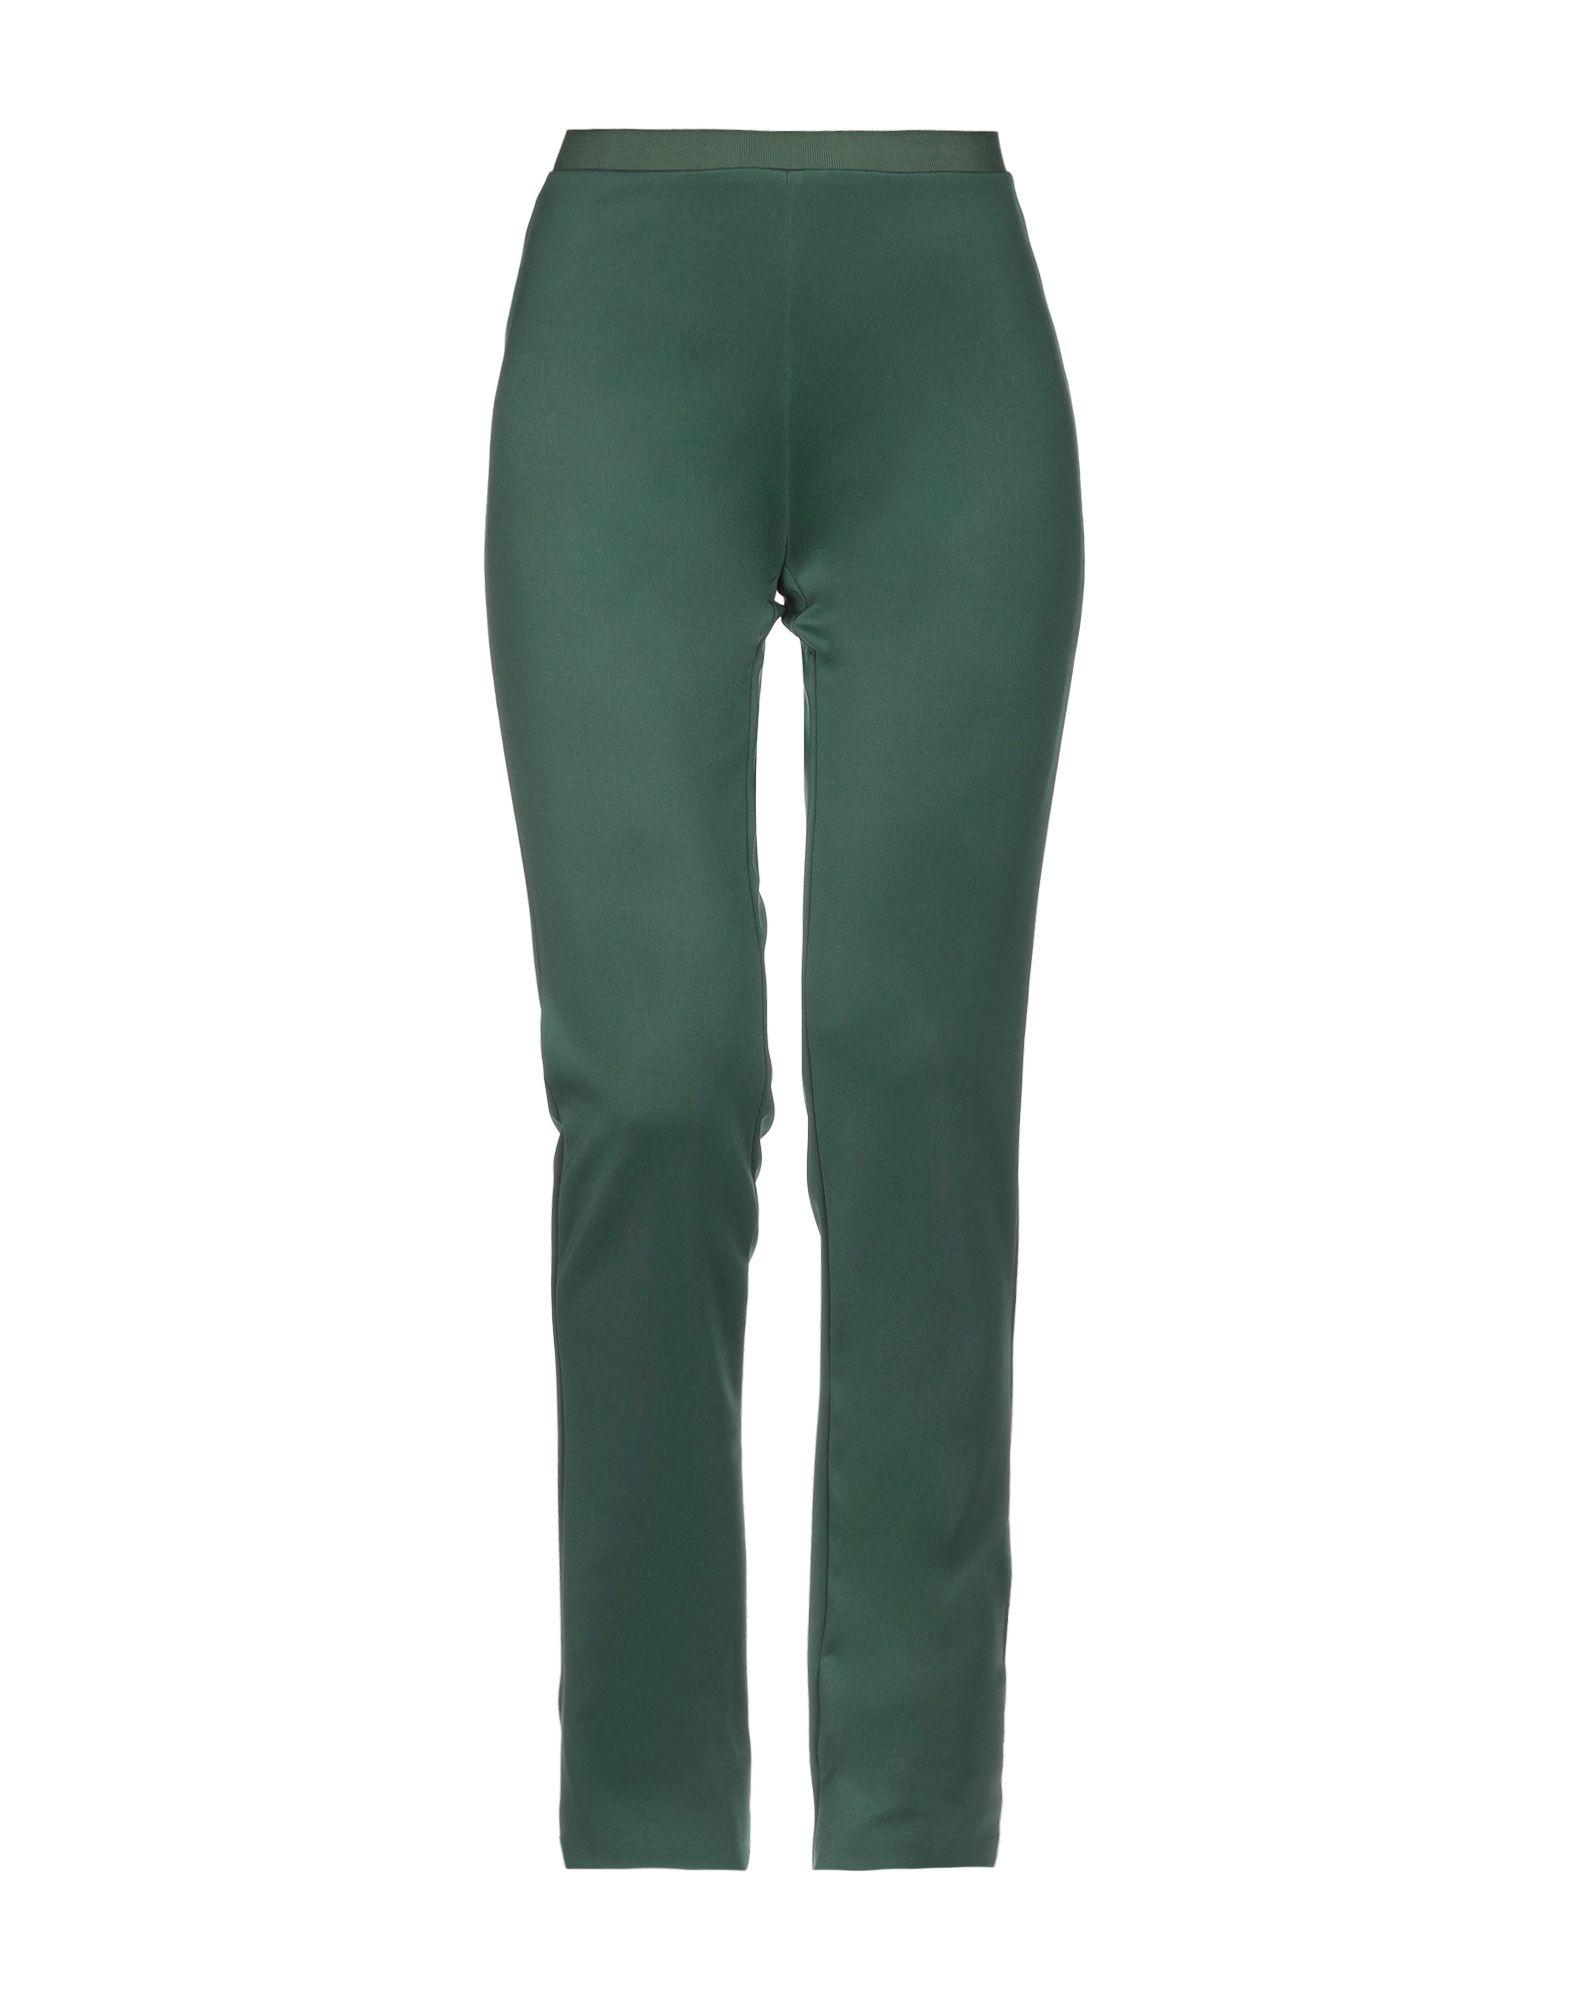 Pantalone Siste' S donna donna donna - 13264120NT 88a